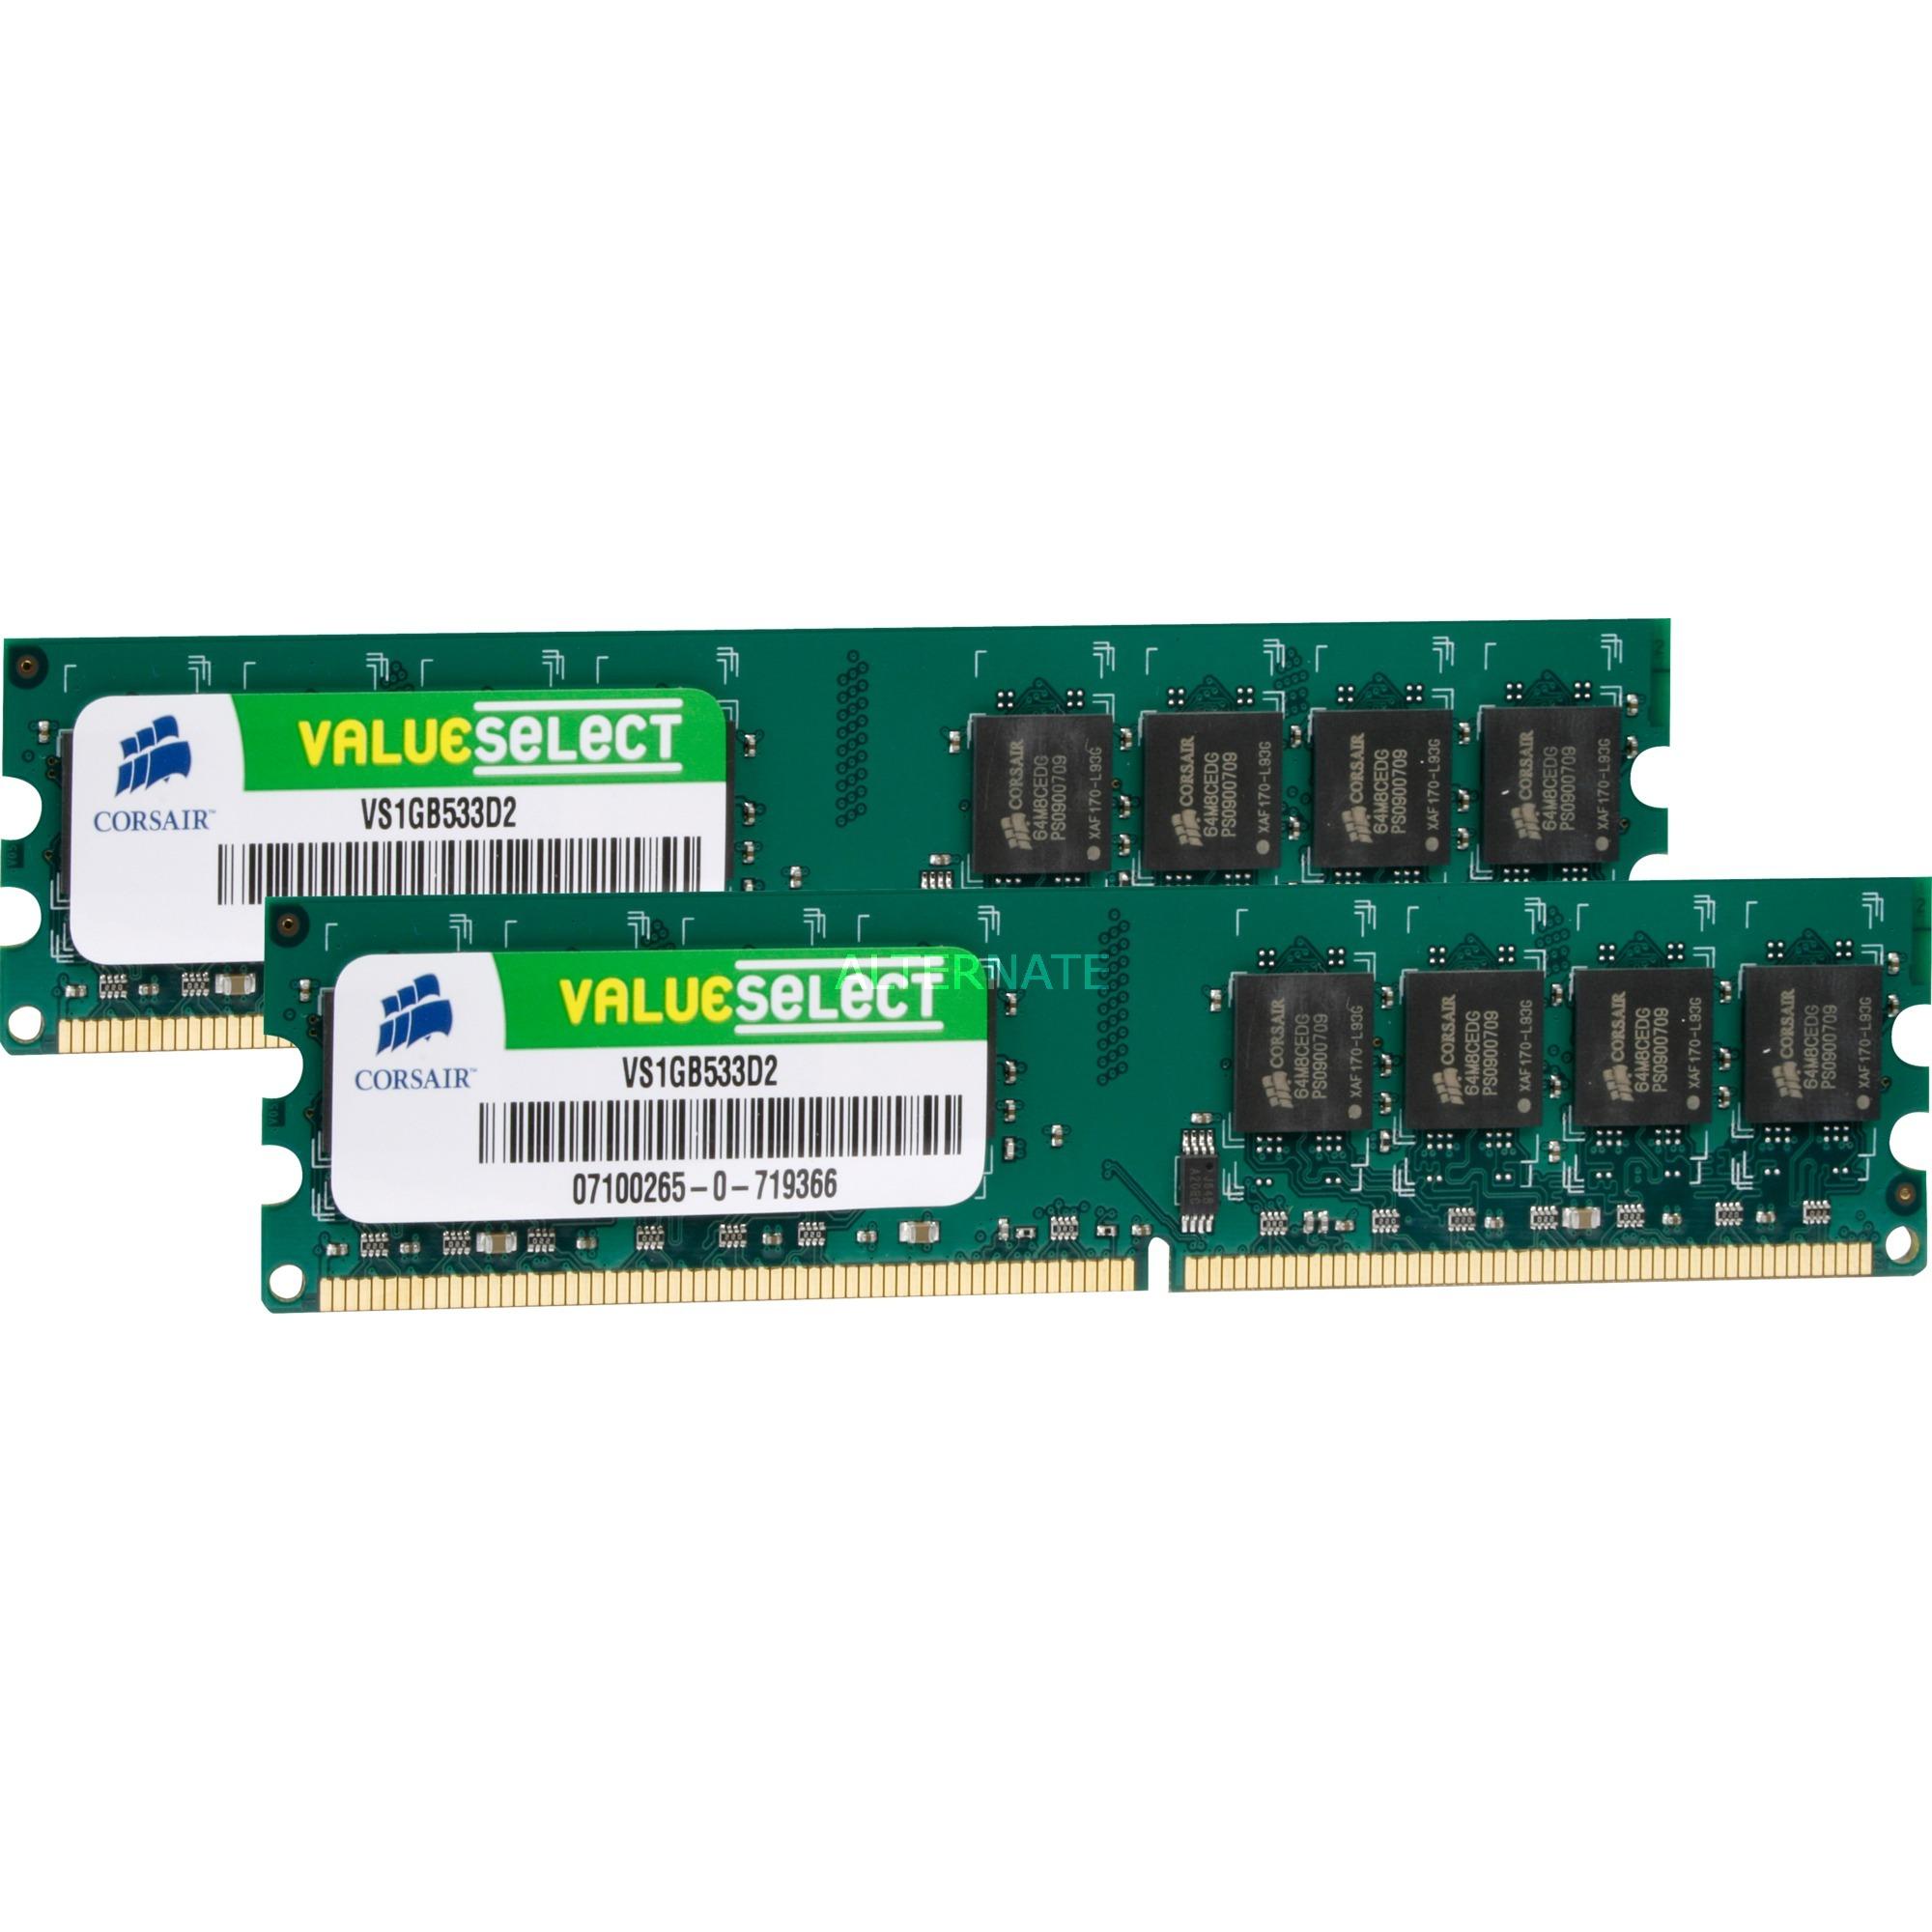 2GB DDR2 SDRAM DIMMs módulo de memoria 533 MHz, Memoria RAM